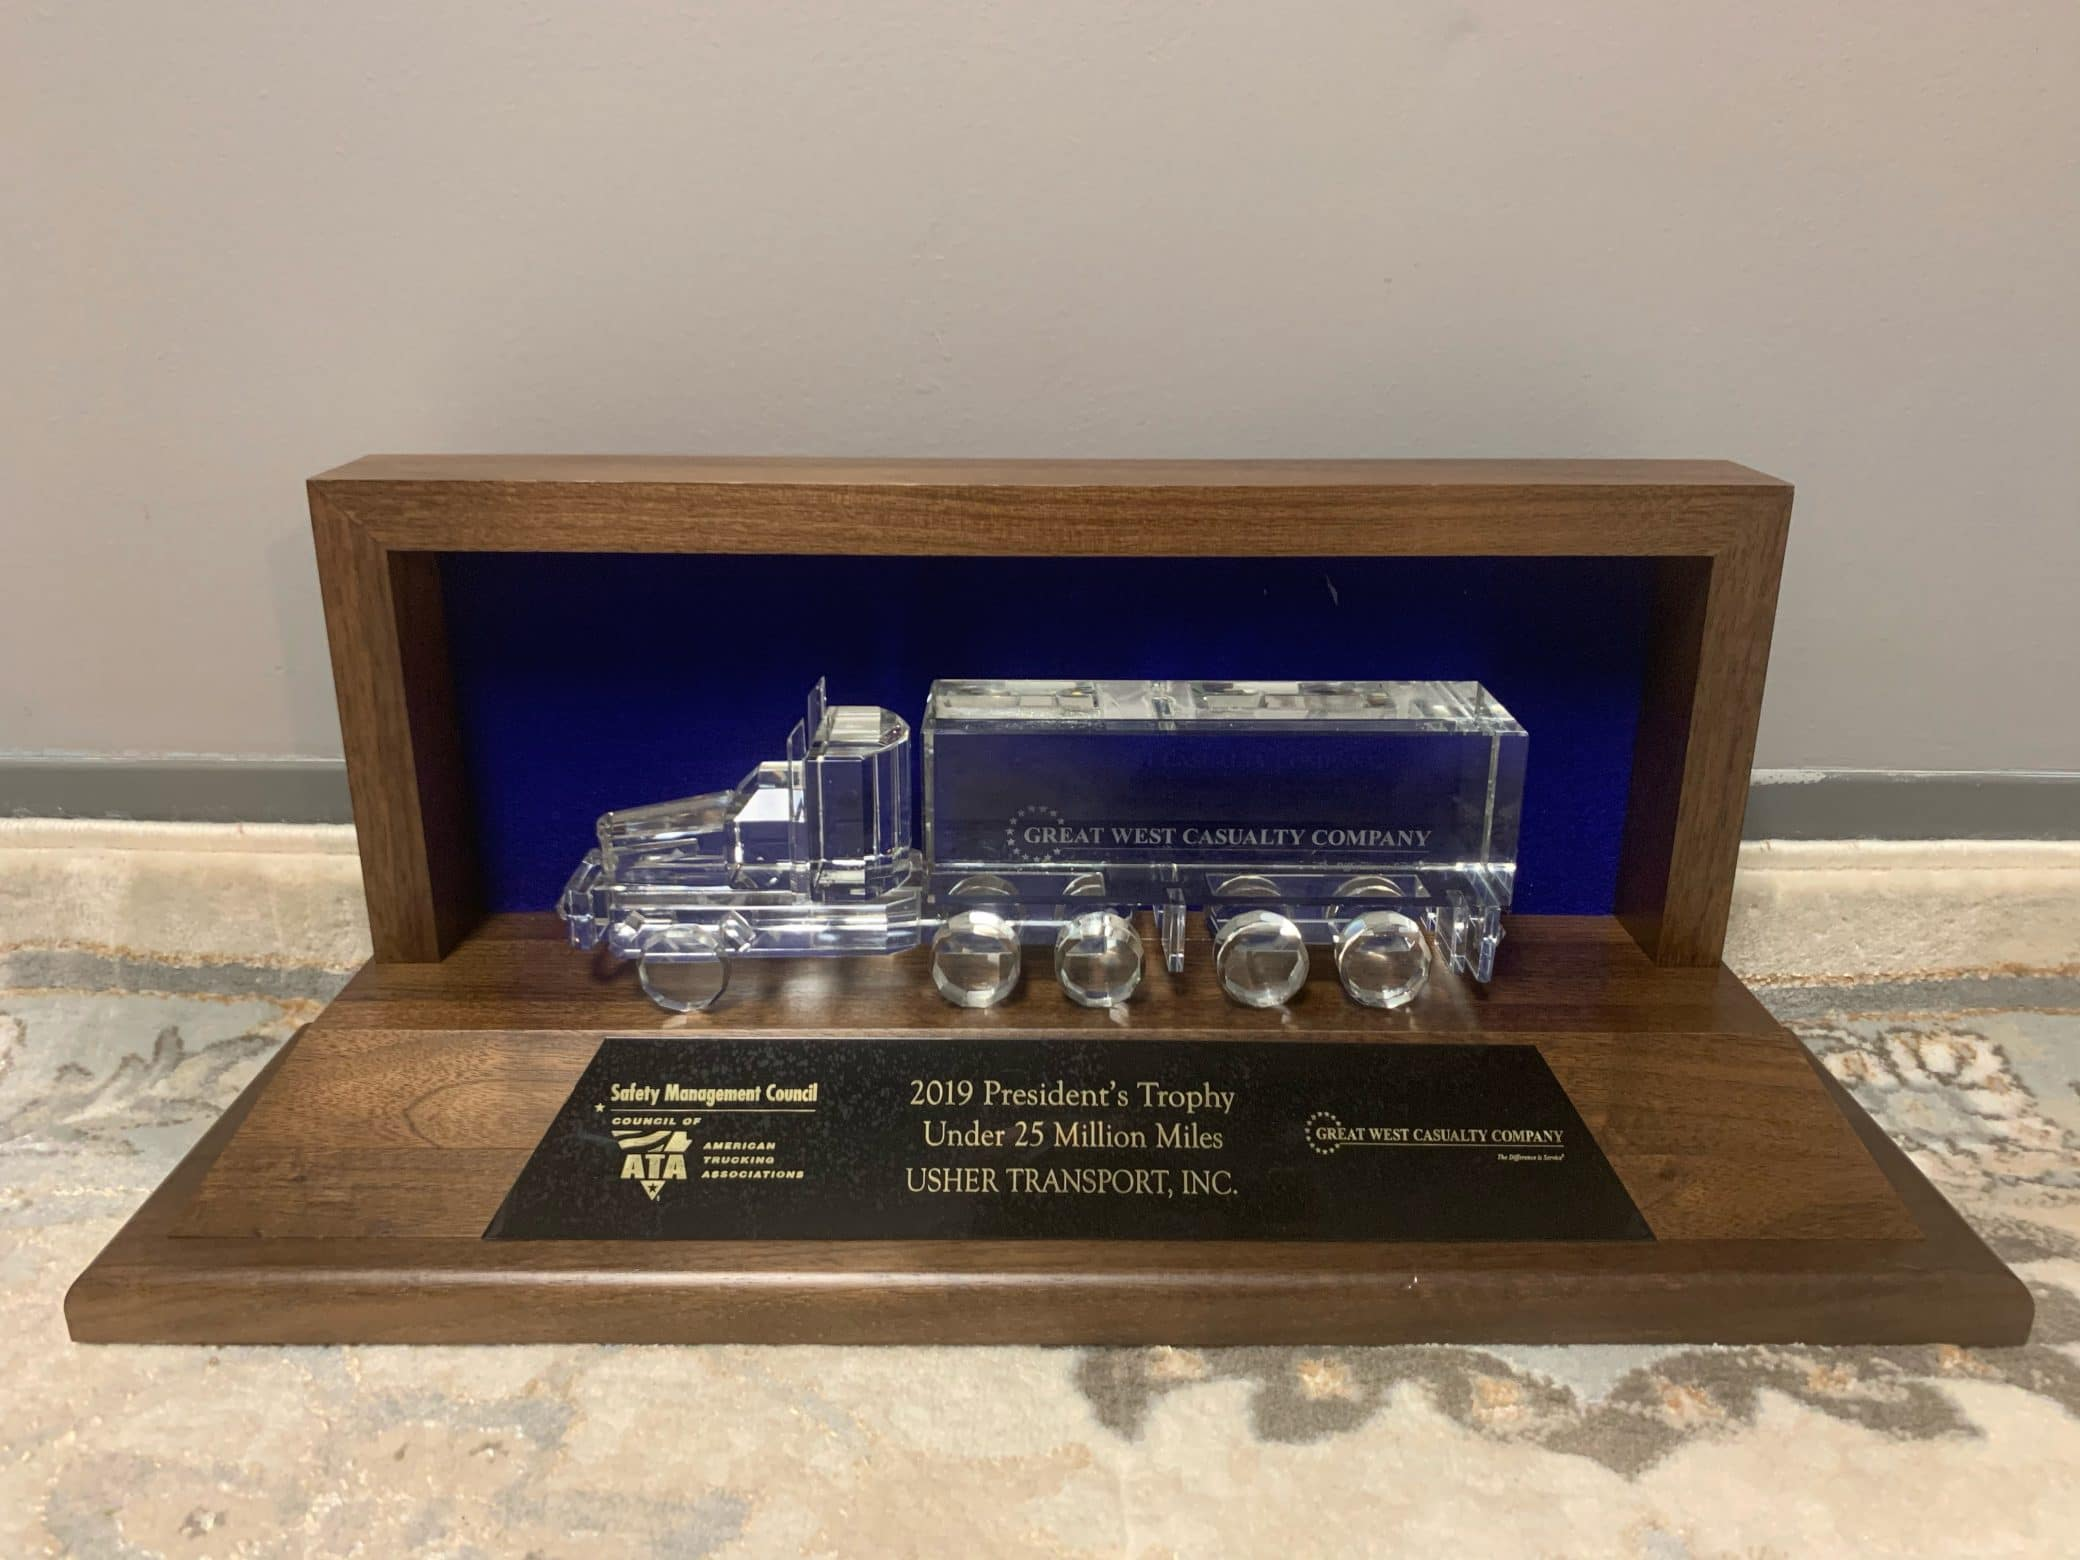 2019 President Trophy image